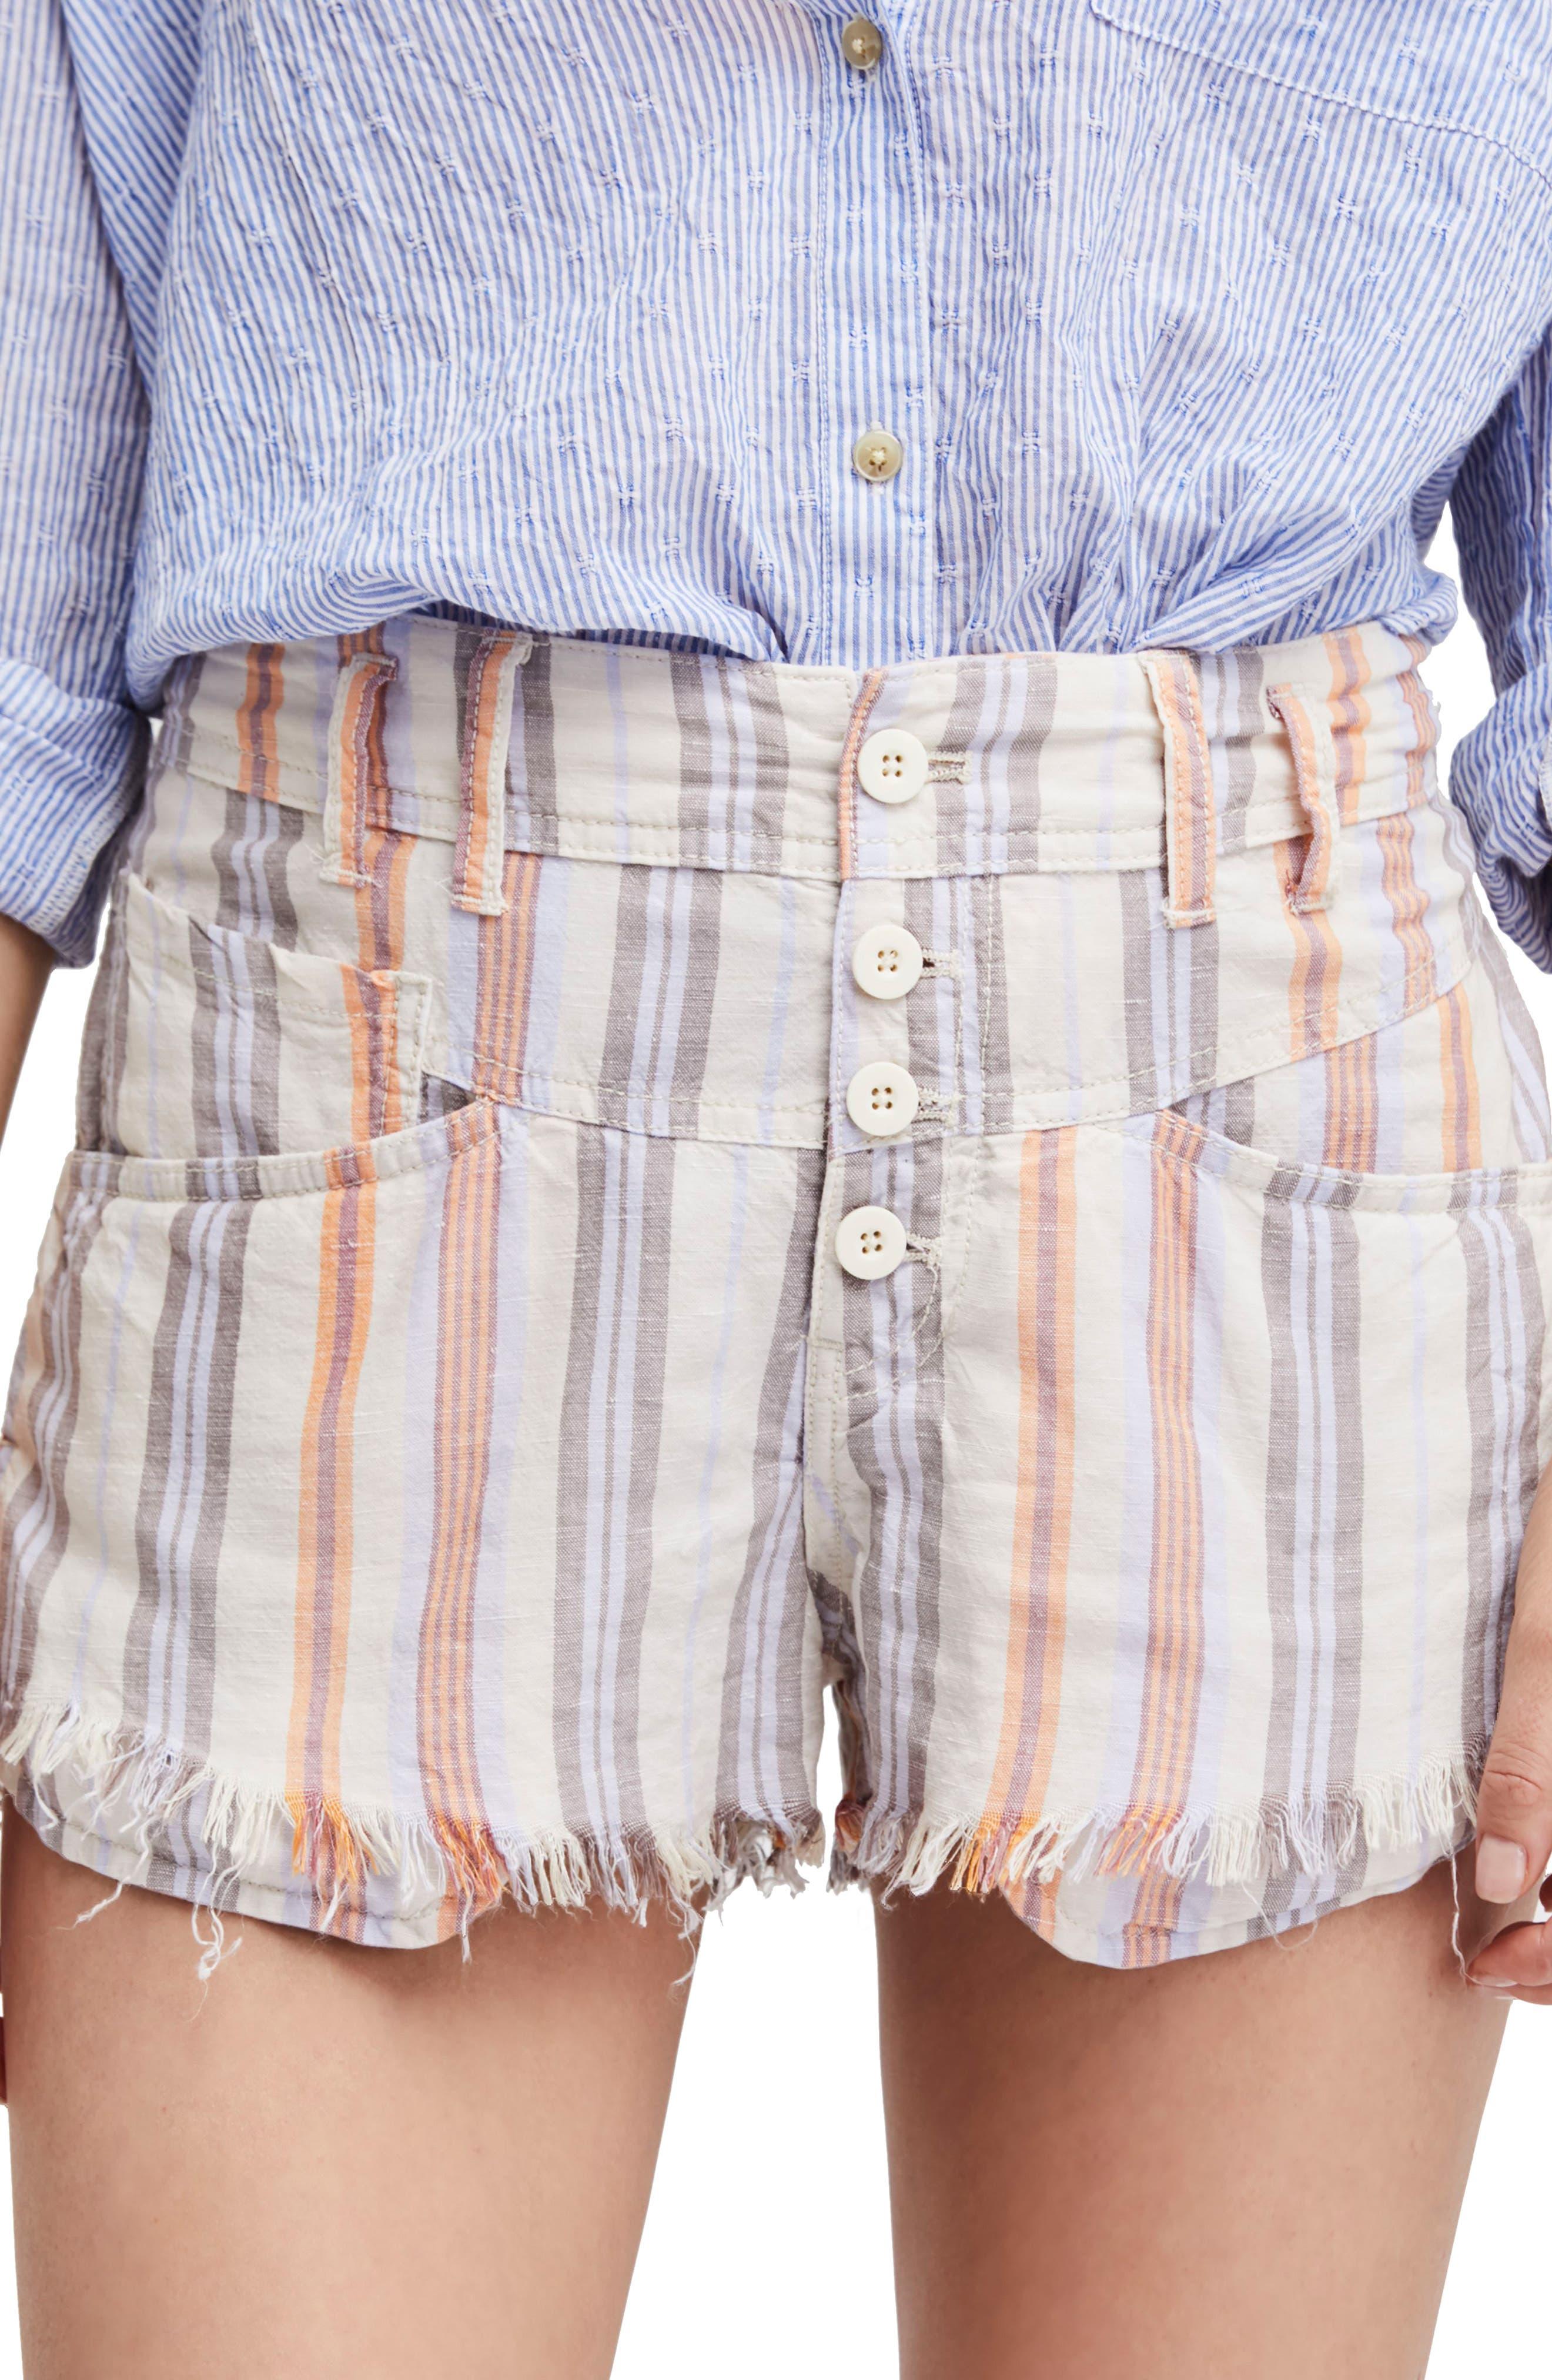 Morning Rain Cutoff Shorts,                         Main,                         color, Nude